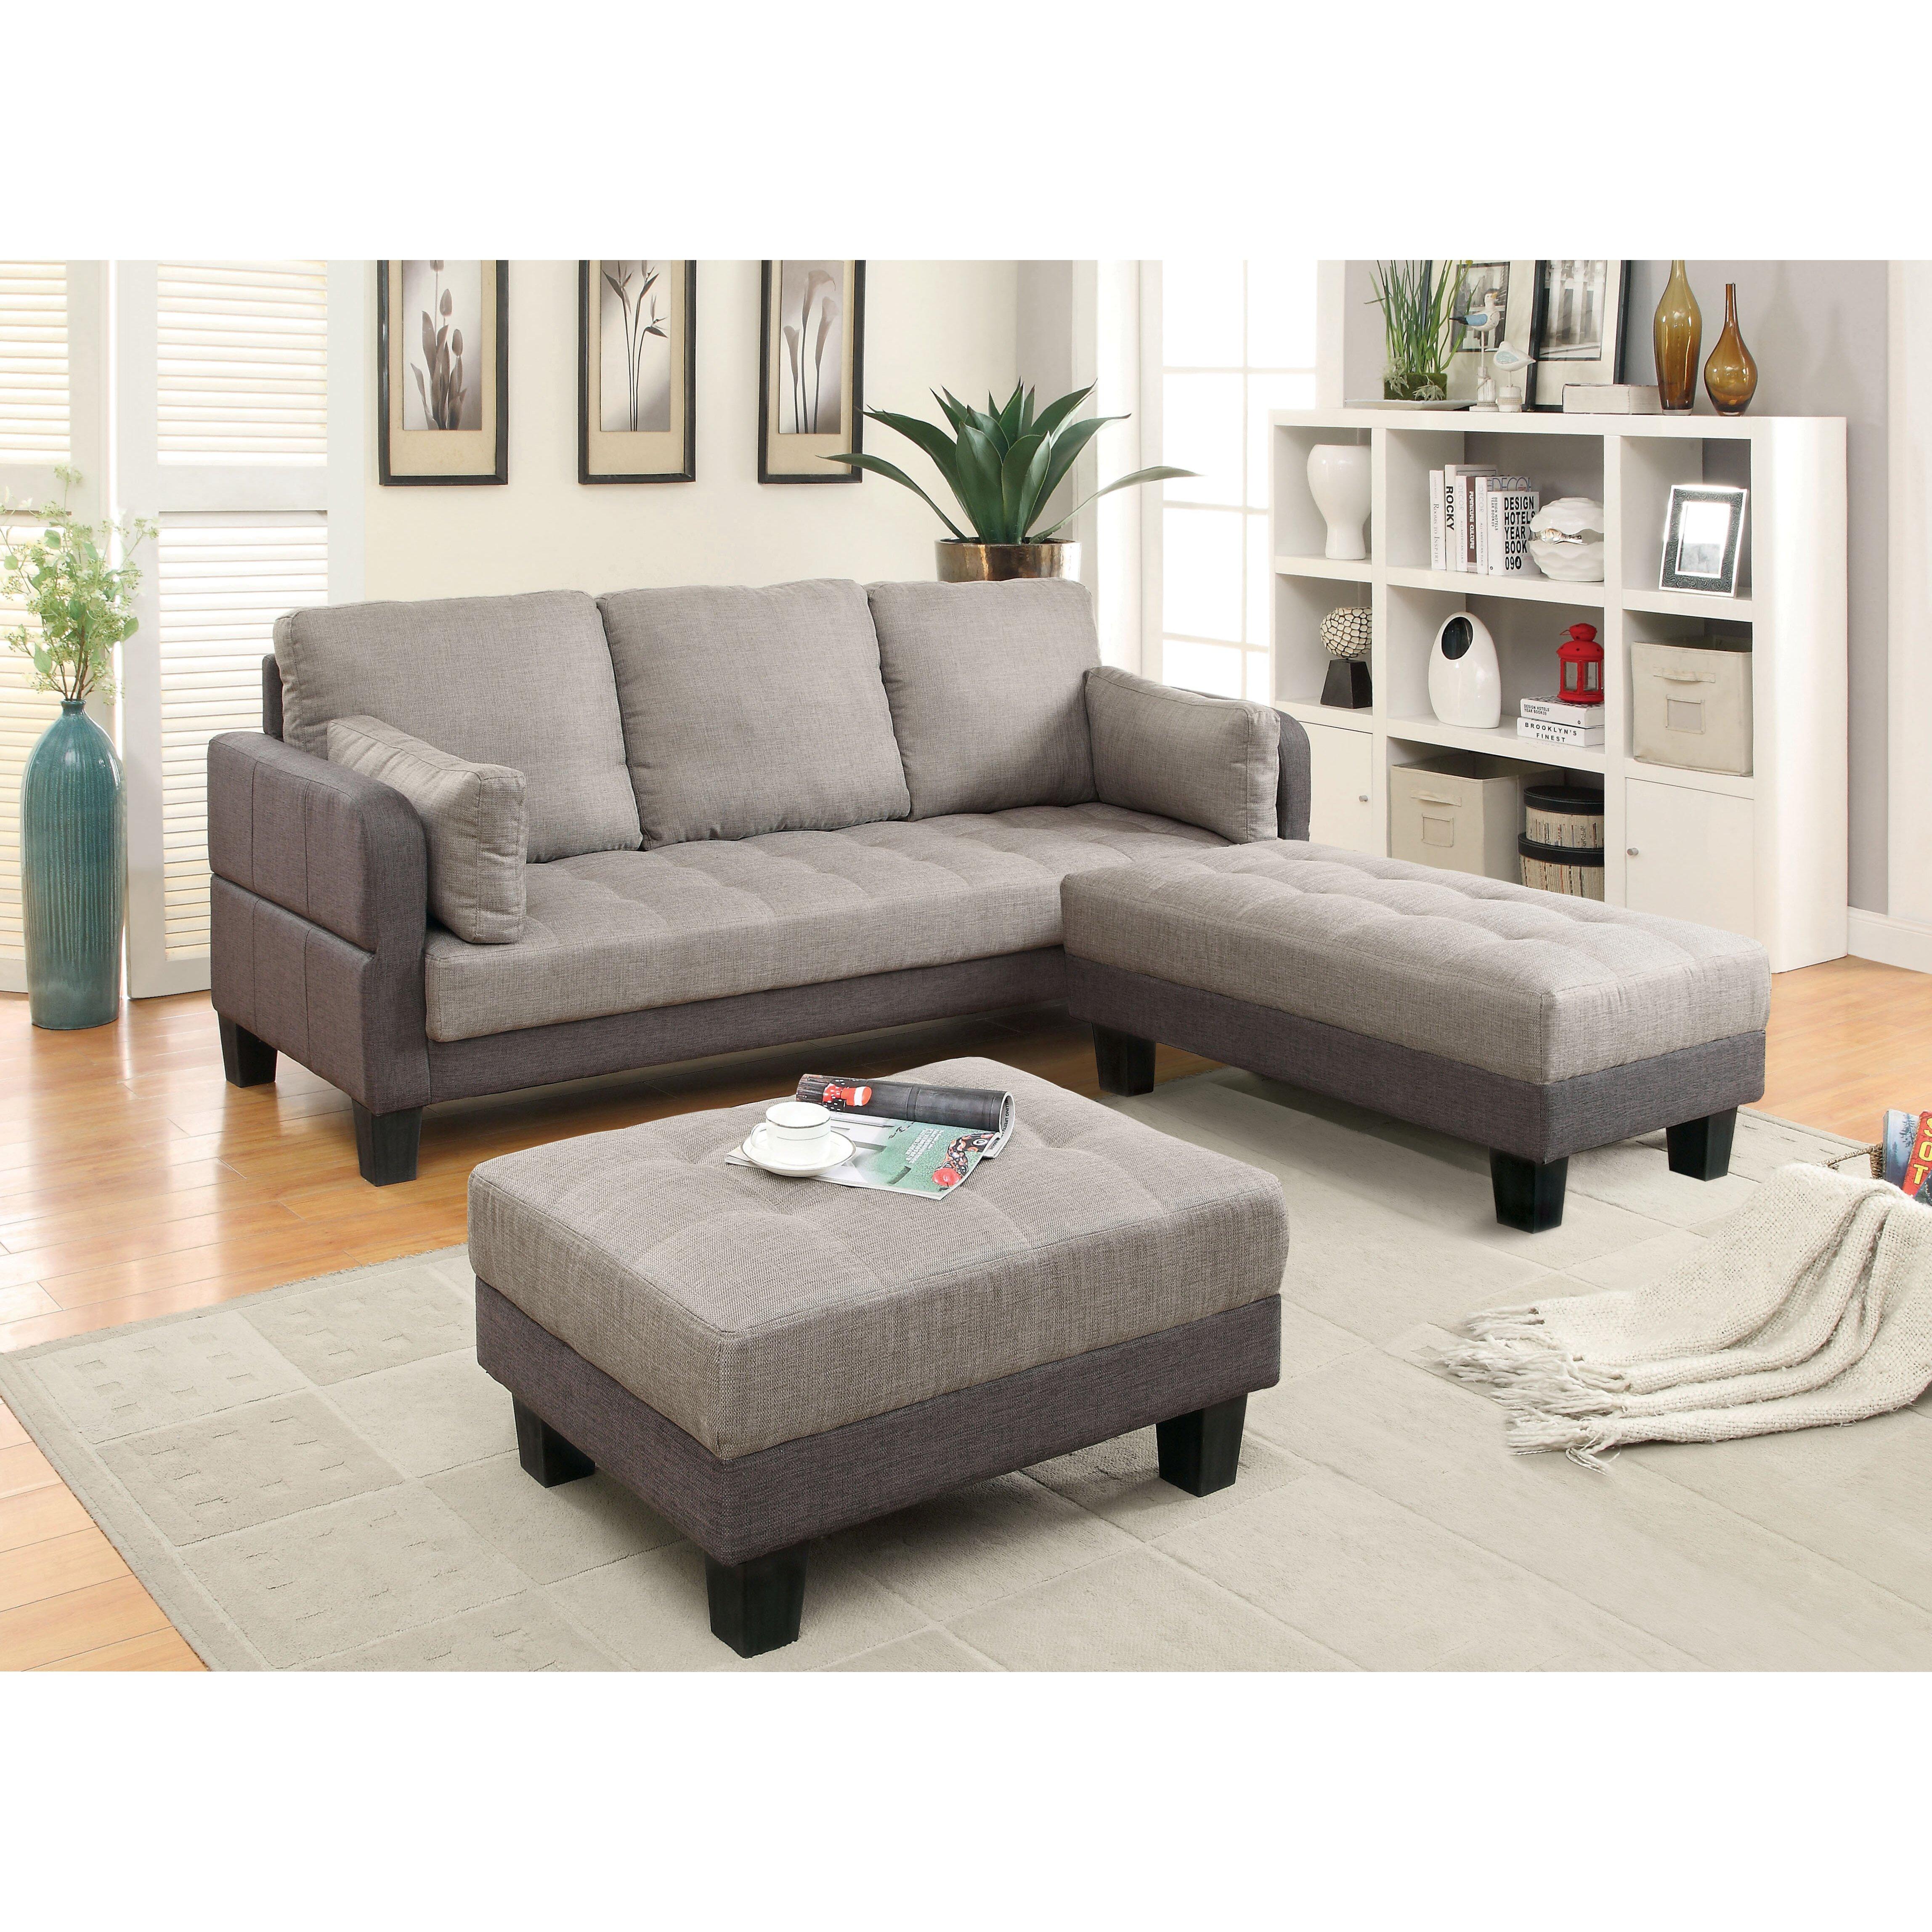 Hokku designs jeffrees sleeper sofa reviews wayfair for Hokku designs living room furniture